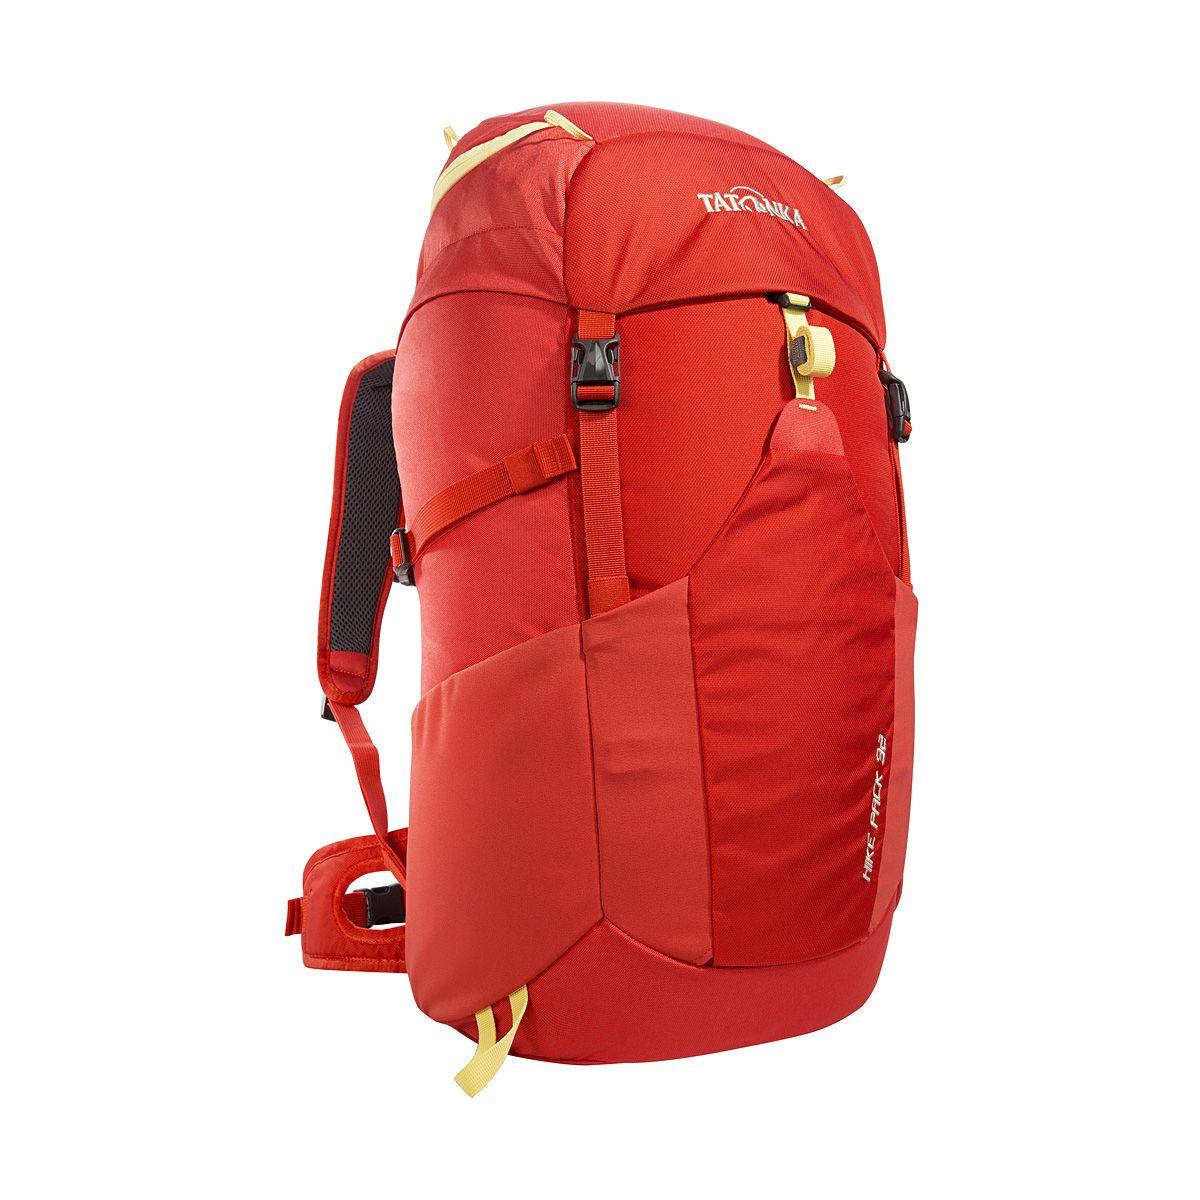 Tatonka Hike pack 32L